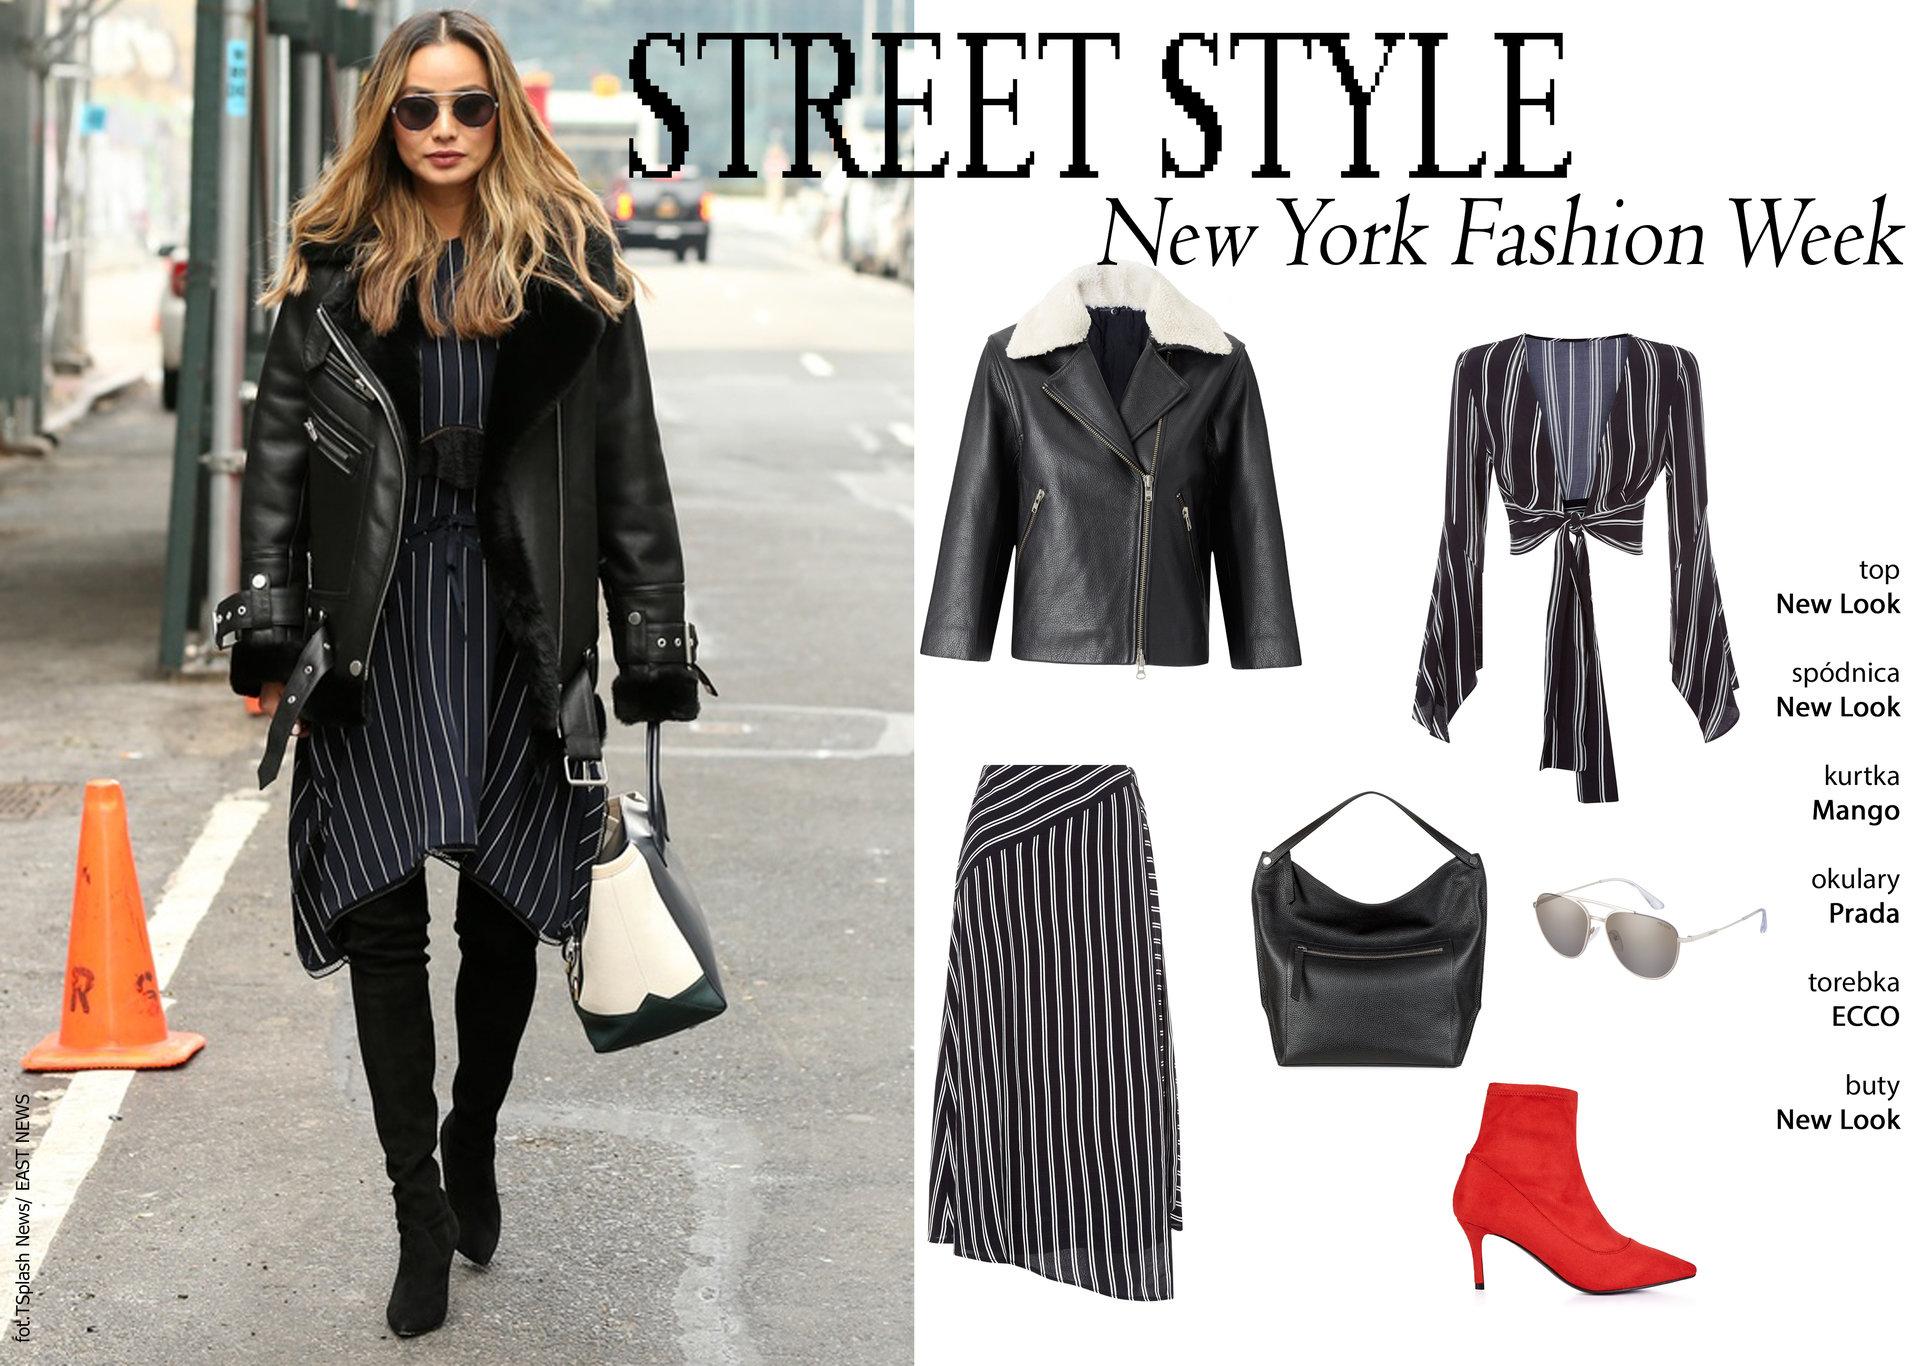 STREET STYLE-NEW YORK FASHION WEEK